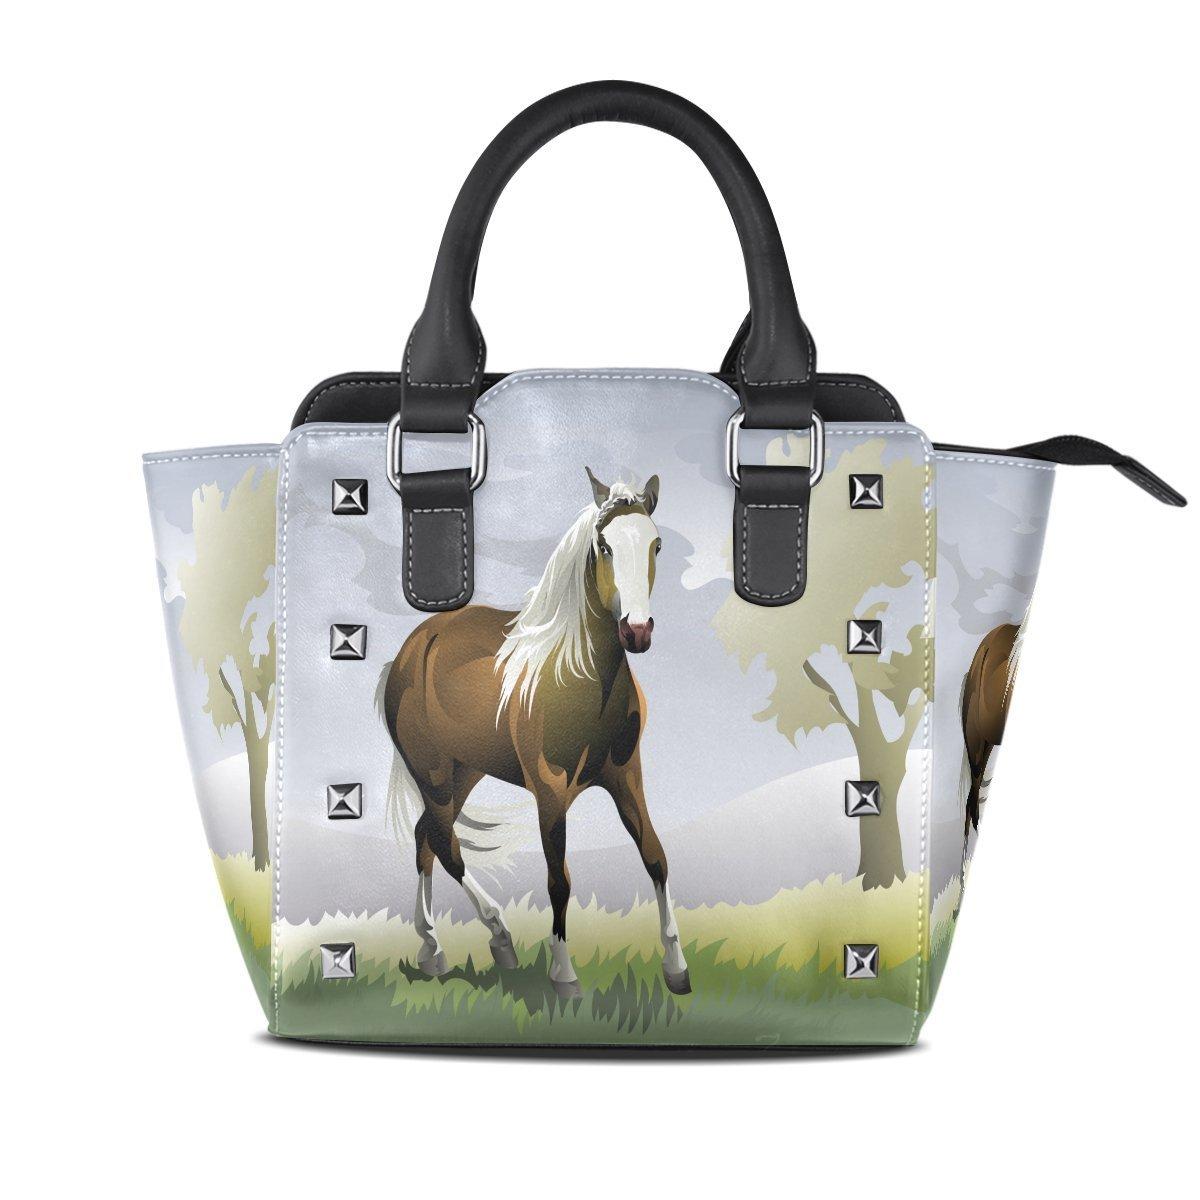 de008db8648 Amazon.com: Ladies Genuine Leather Tote Bags Running Horse Womens ...